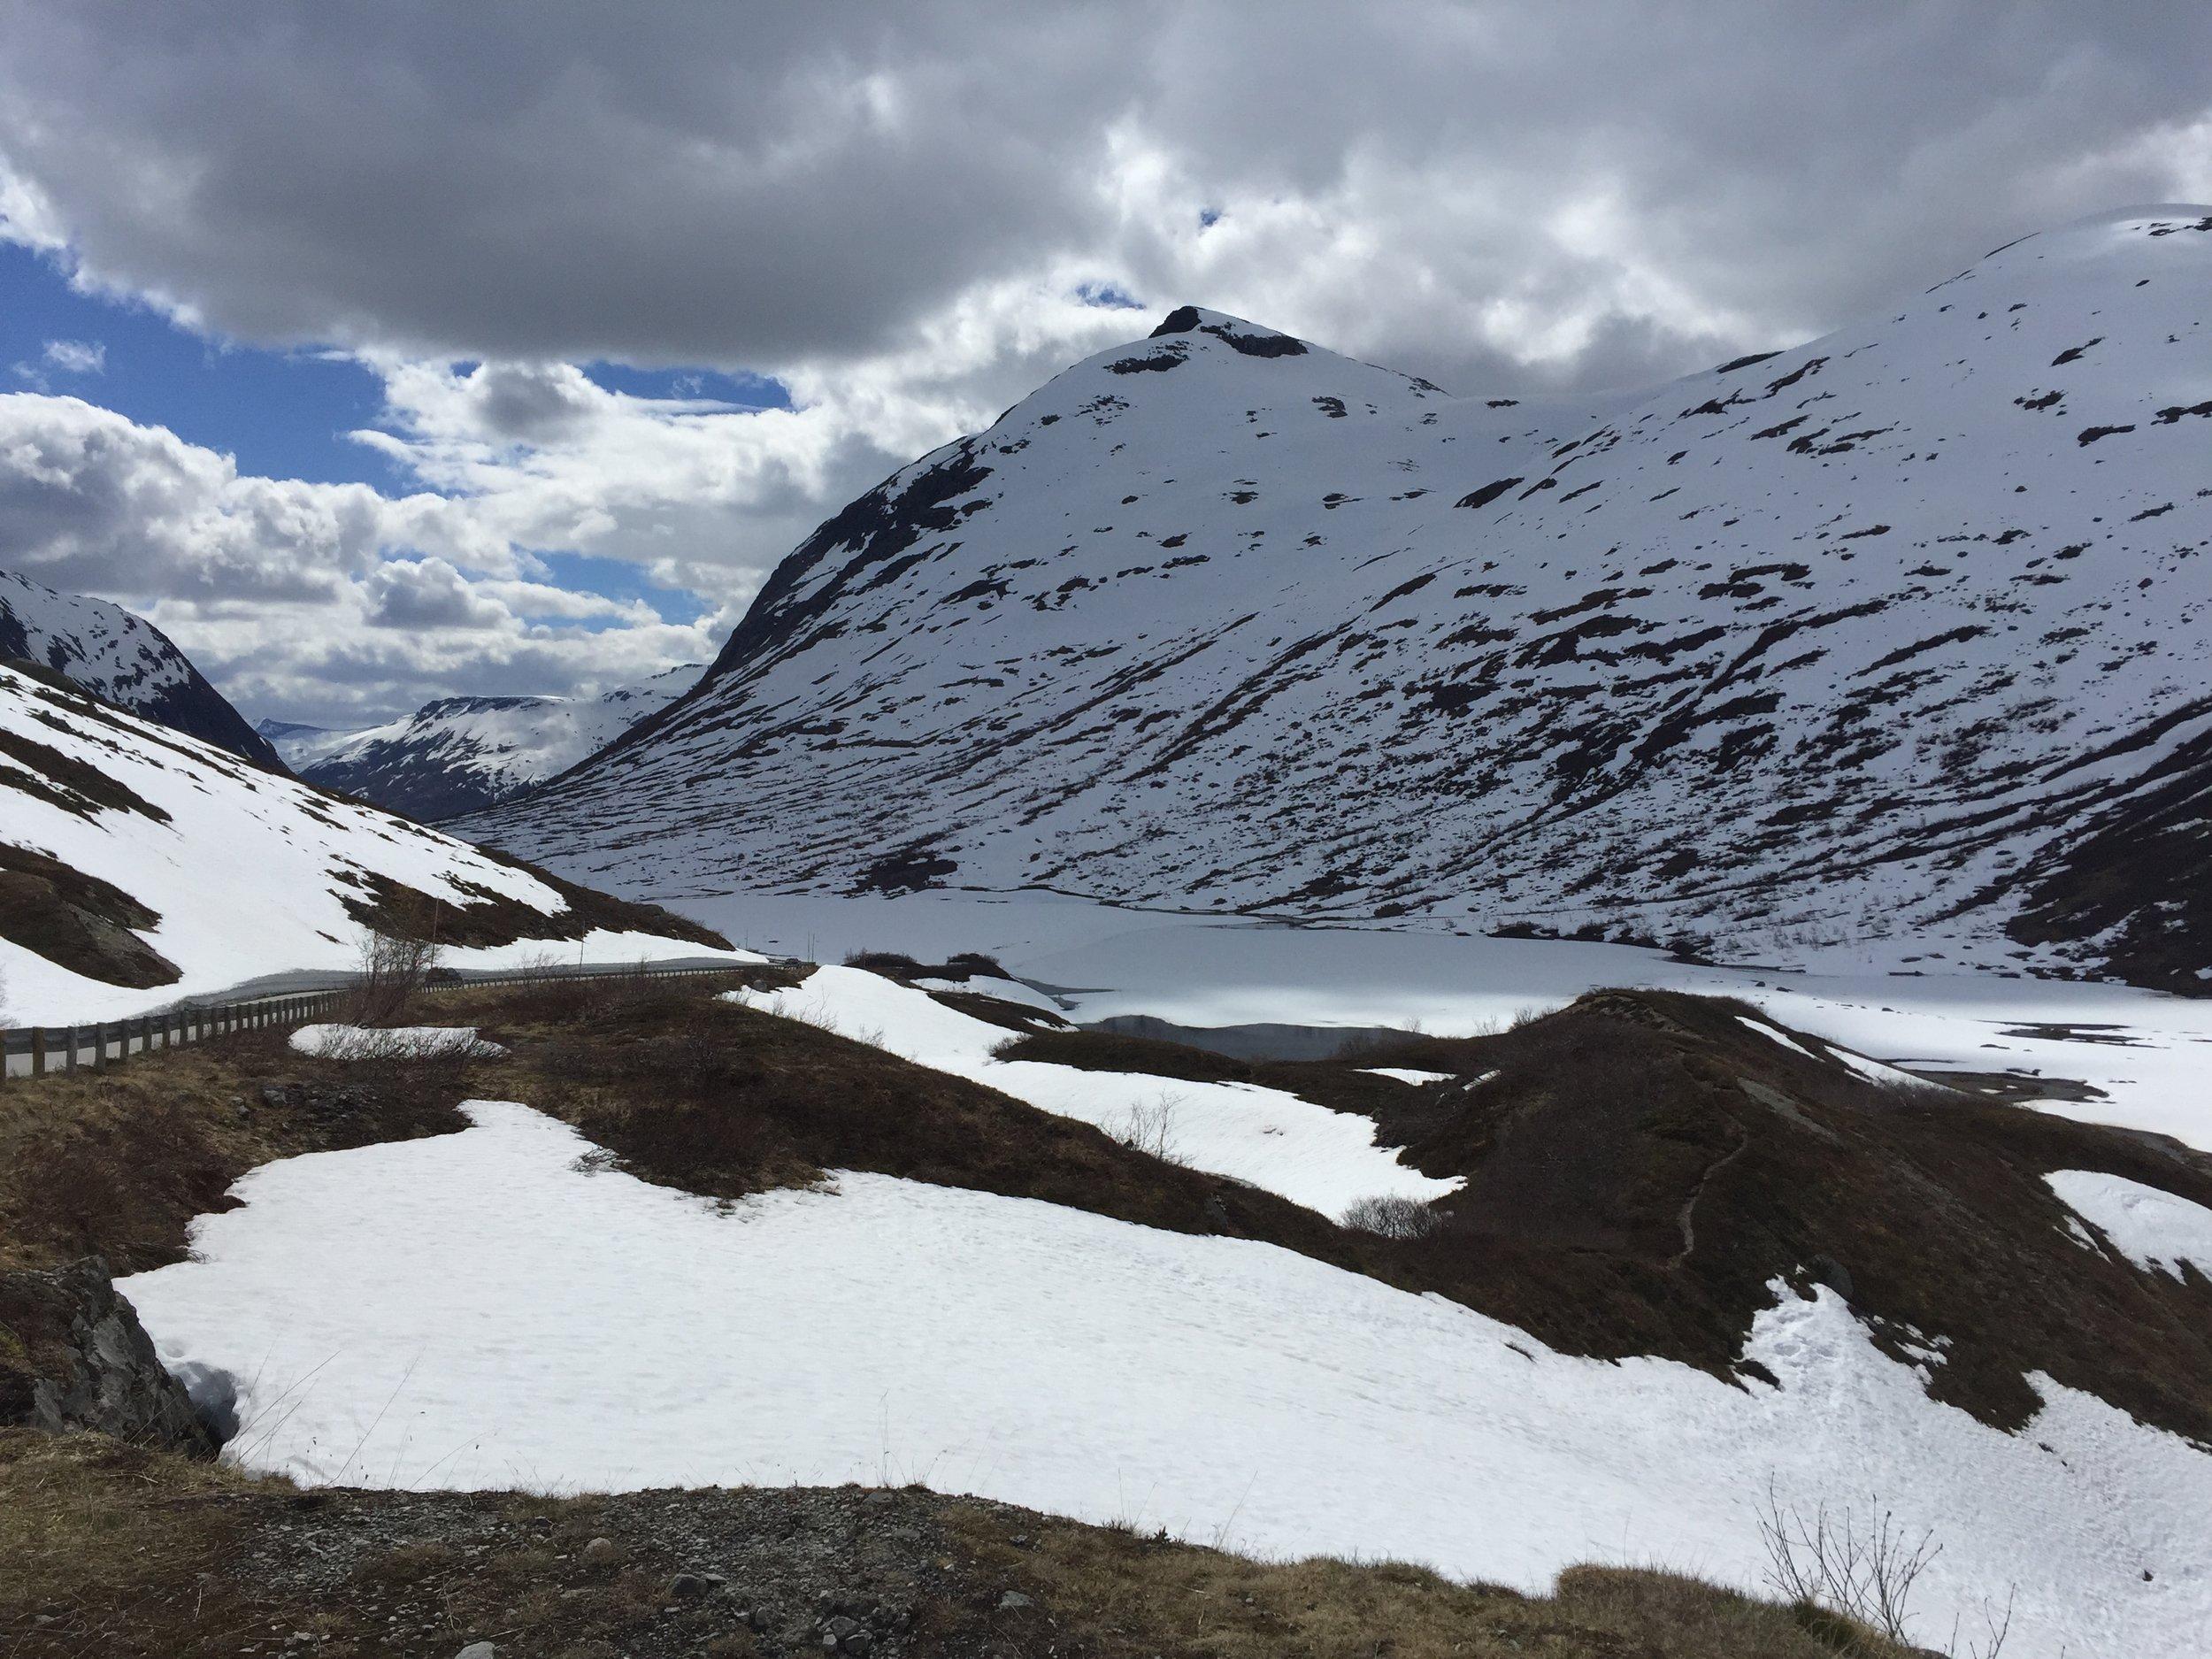 Frozen lake aside Geiranger - Trollstigen National Tourist Route.